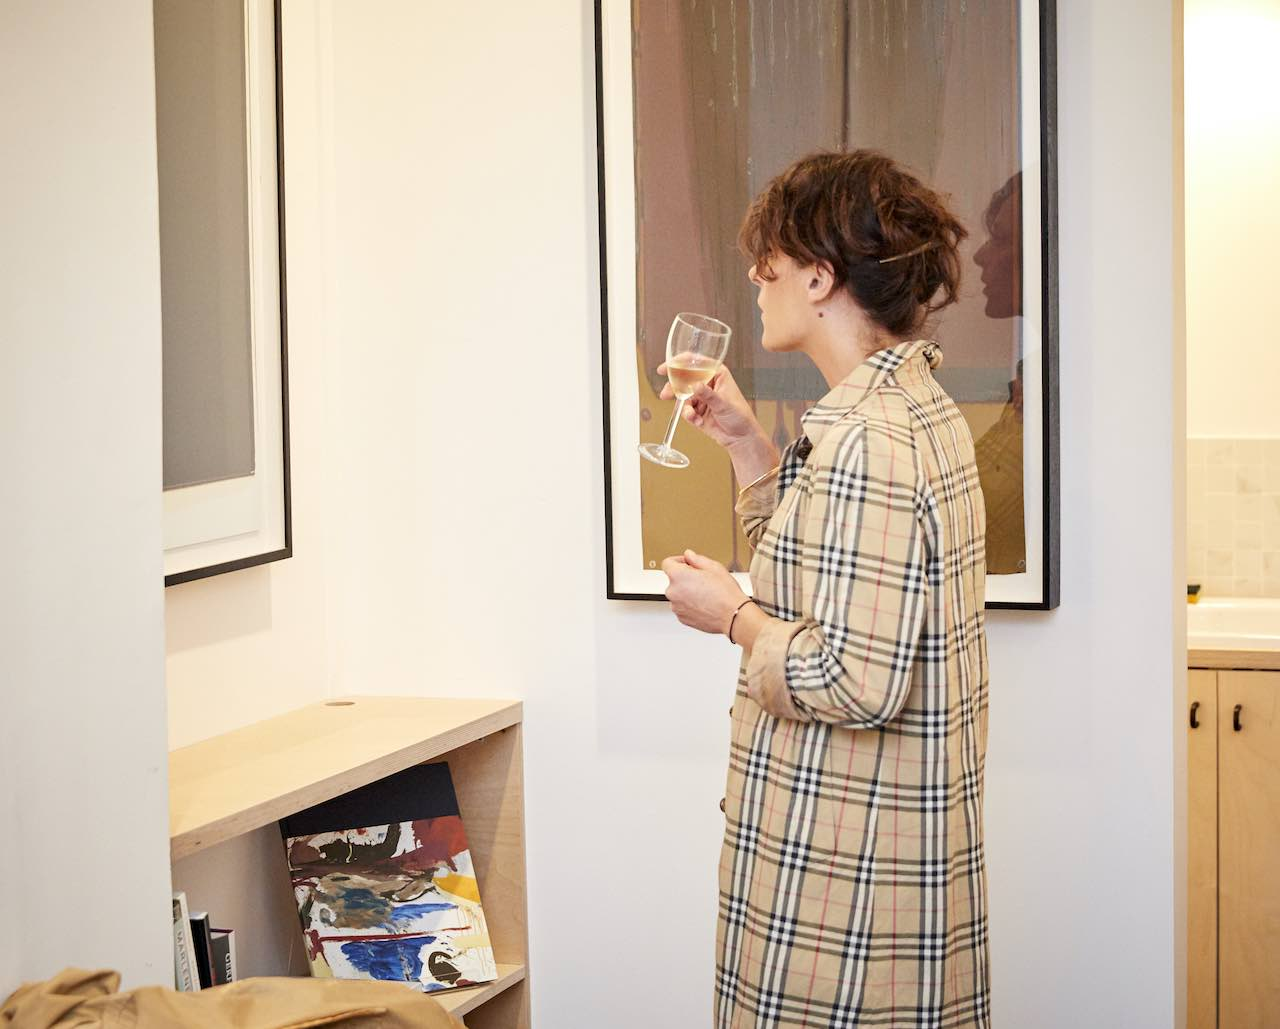 Ellen Carey at Galerie Miranda Paris